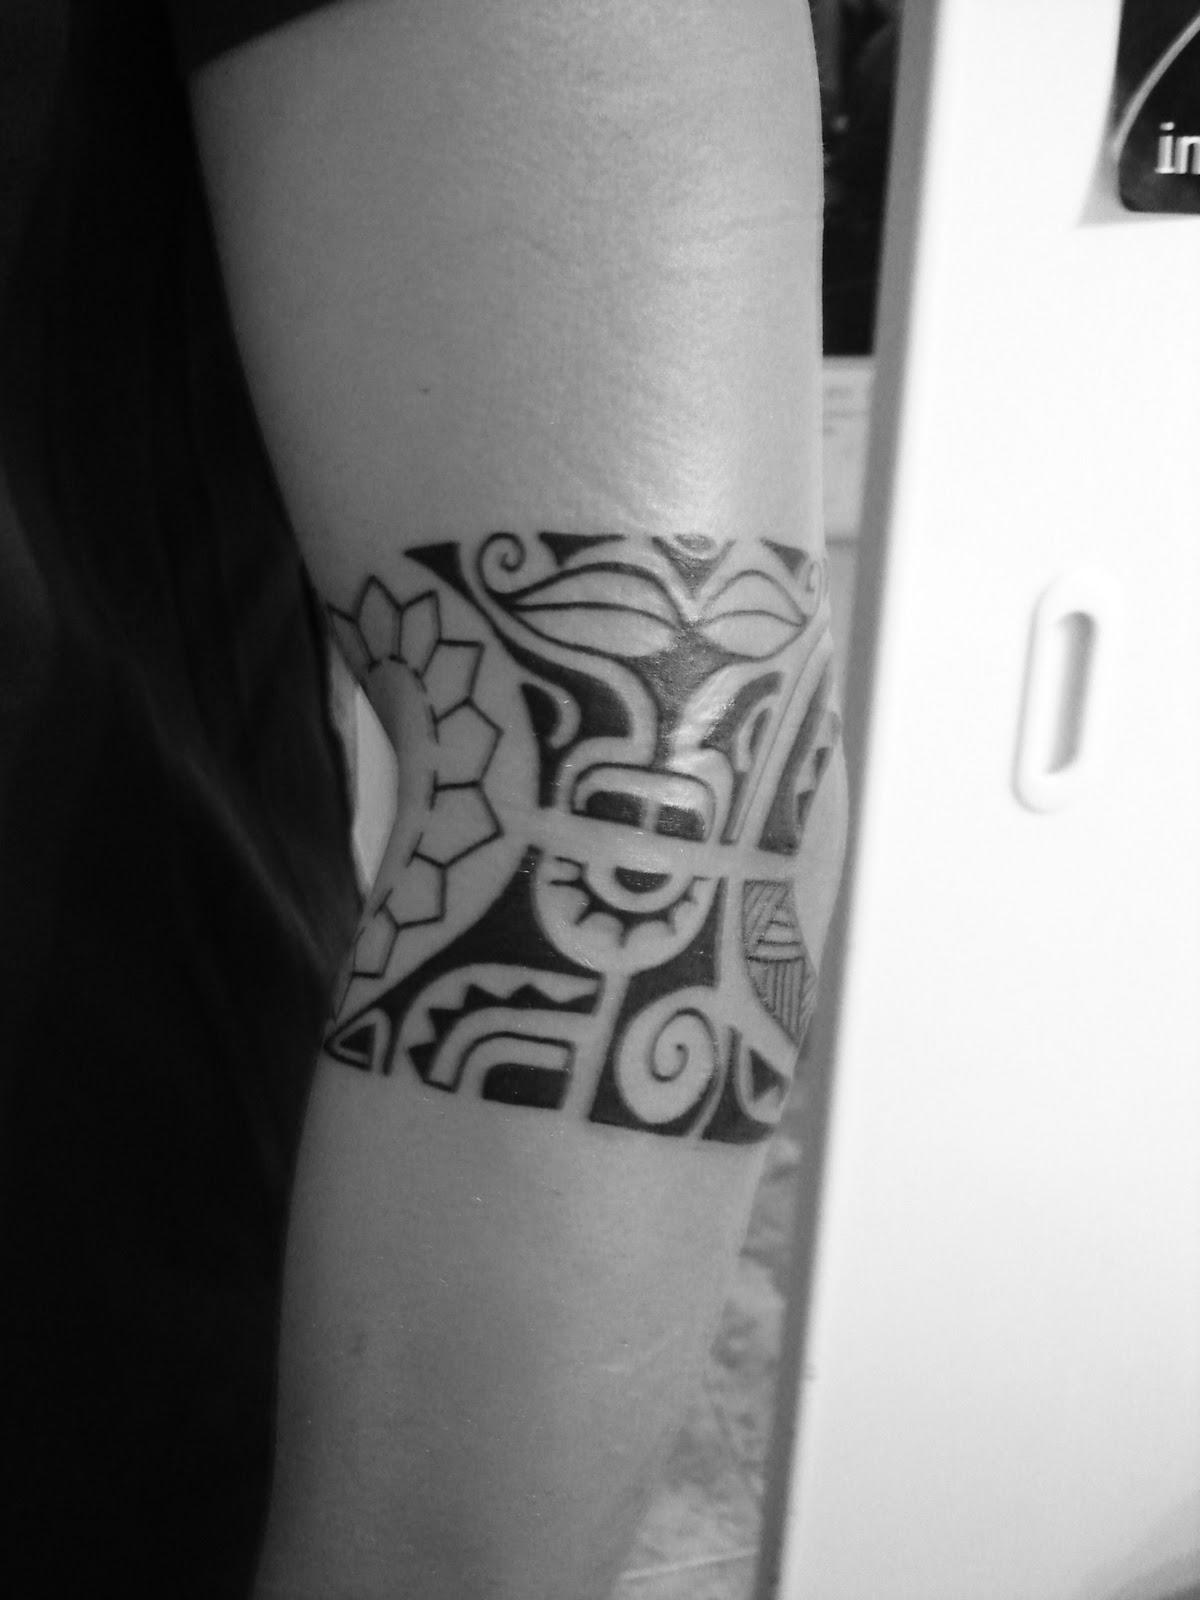 Toop Tattoo Tatuaje Brazalete Maori En Freehand Alicante Tatuaje - Maori-tattoo-brazalete